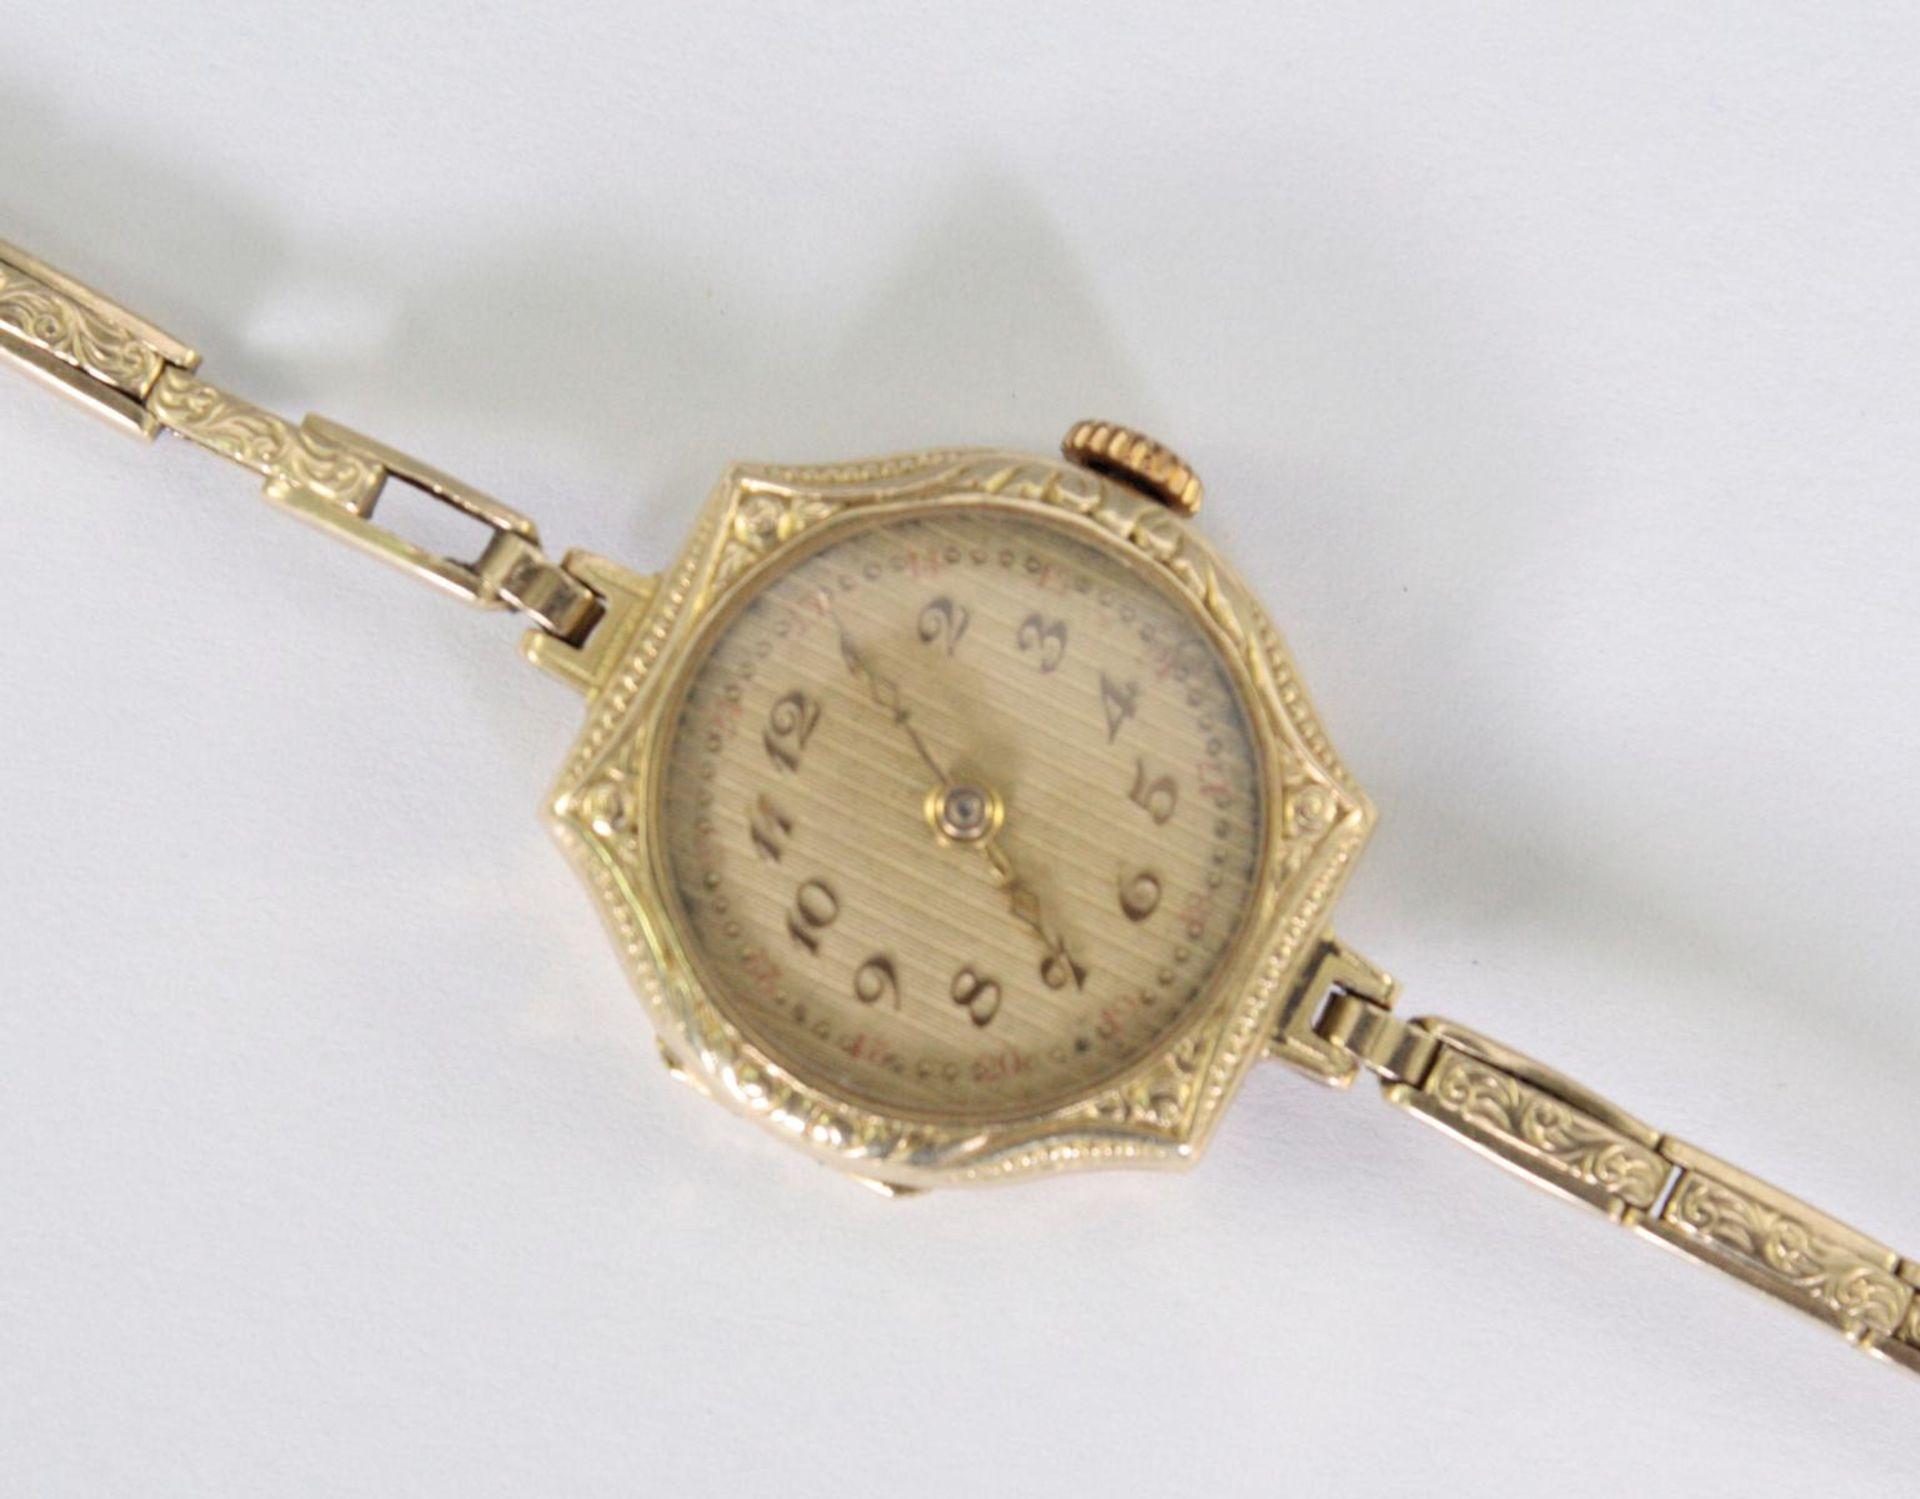 Antike Damenarmbanduhr, 14 Karat Gelbgold - Bild 2 aus 5